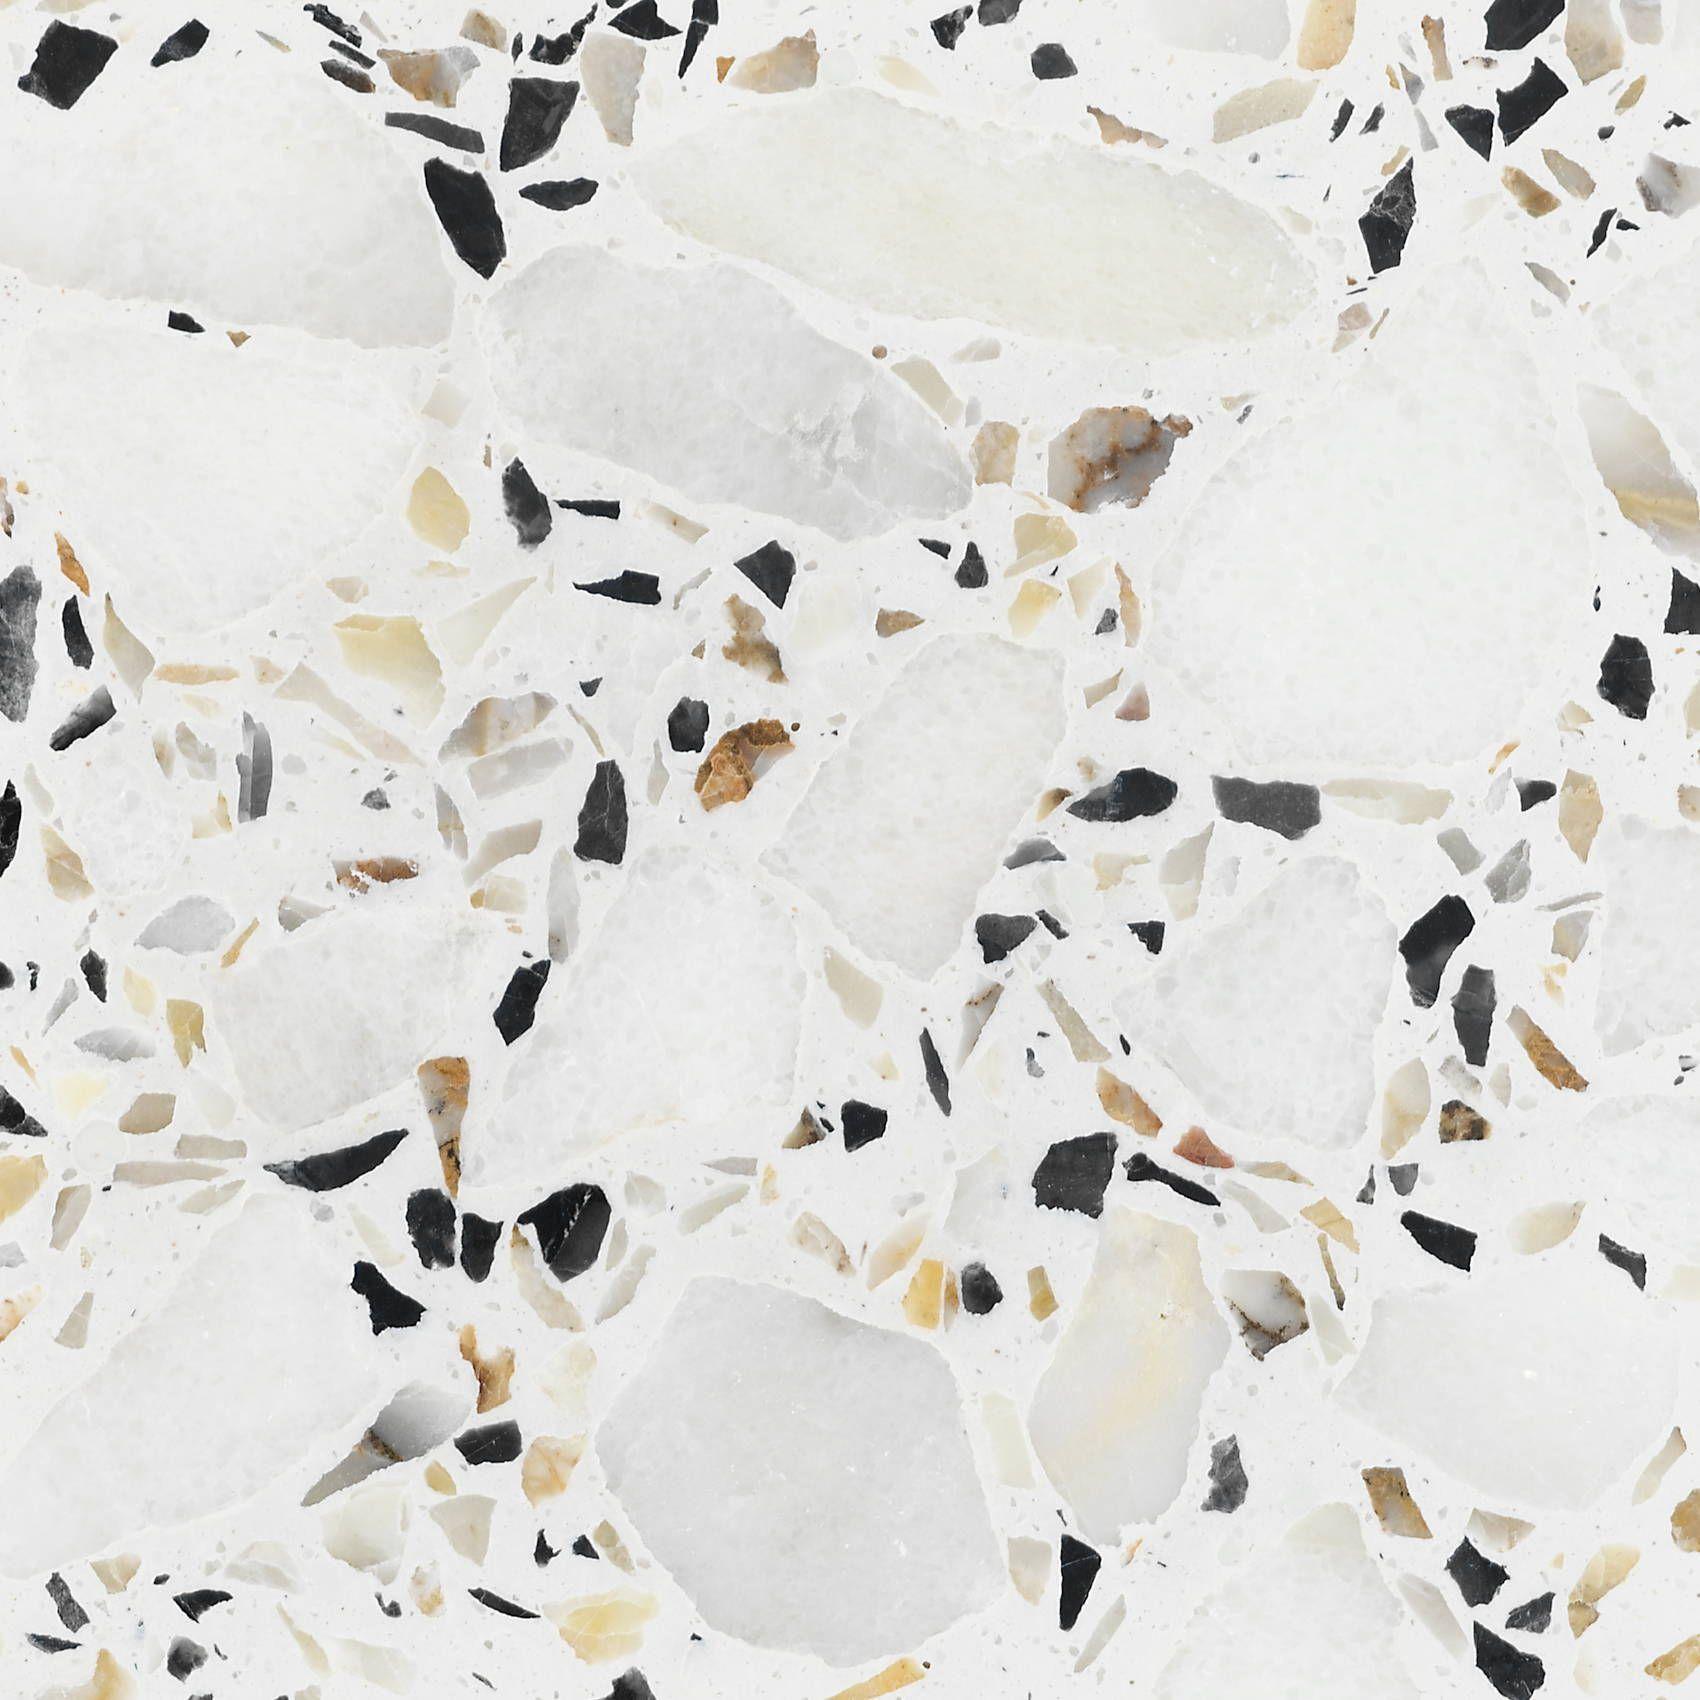 Terrazzo Australian Marble Surface Materials